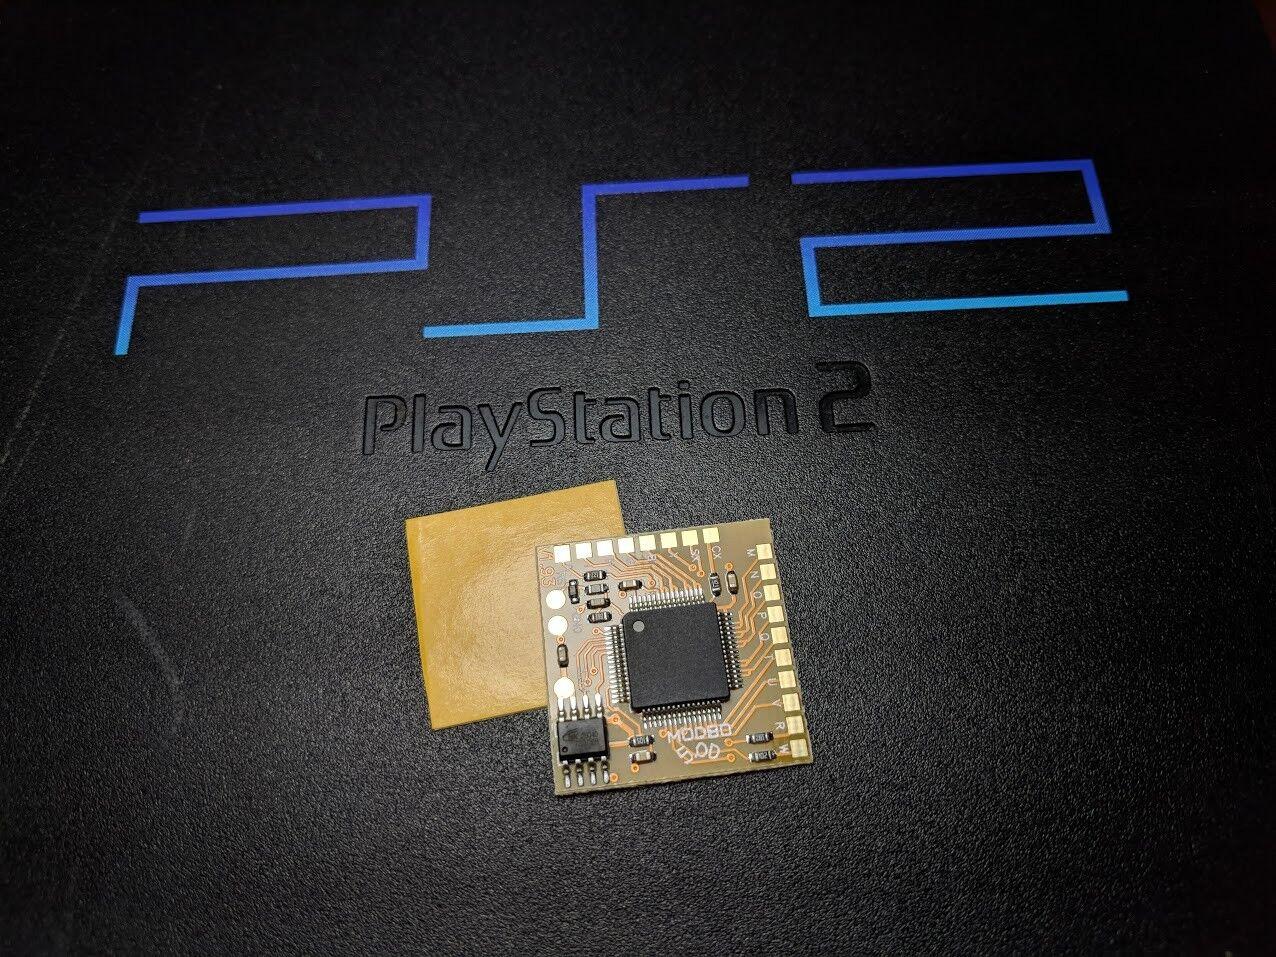 Ebay Modbo 5 0 - PlayStation 2 (PS2, fat, slim) - Modchip - New - US Seller